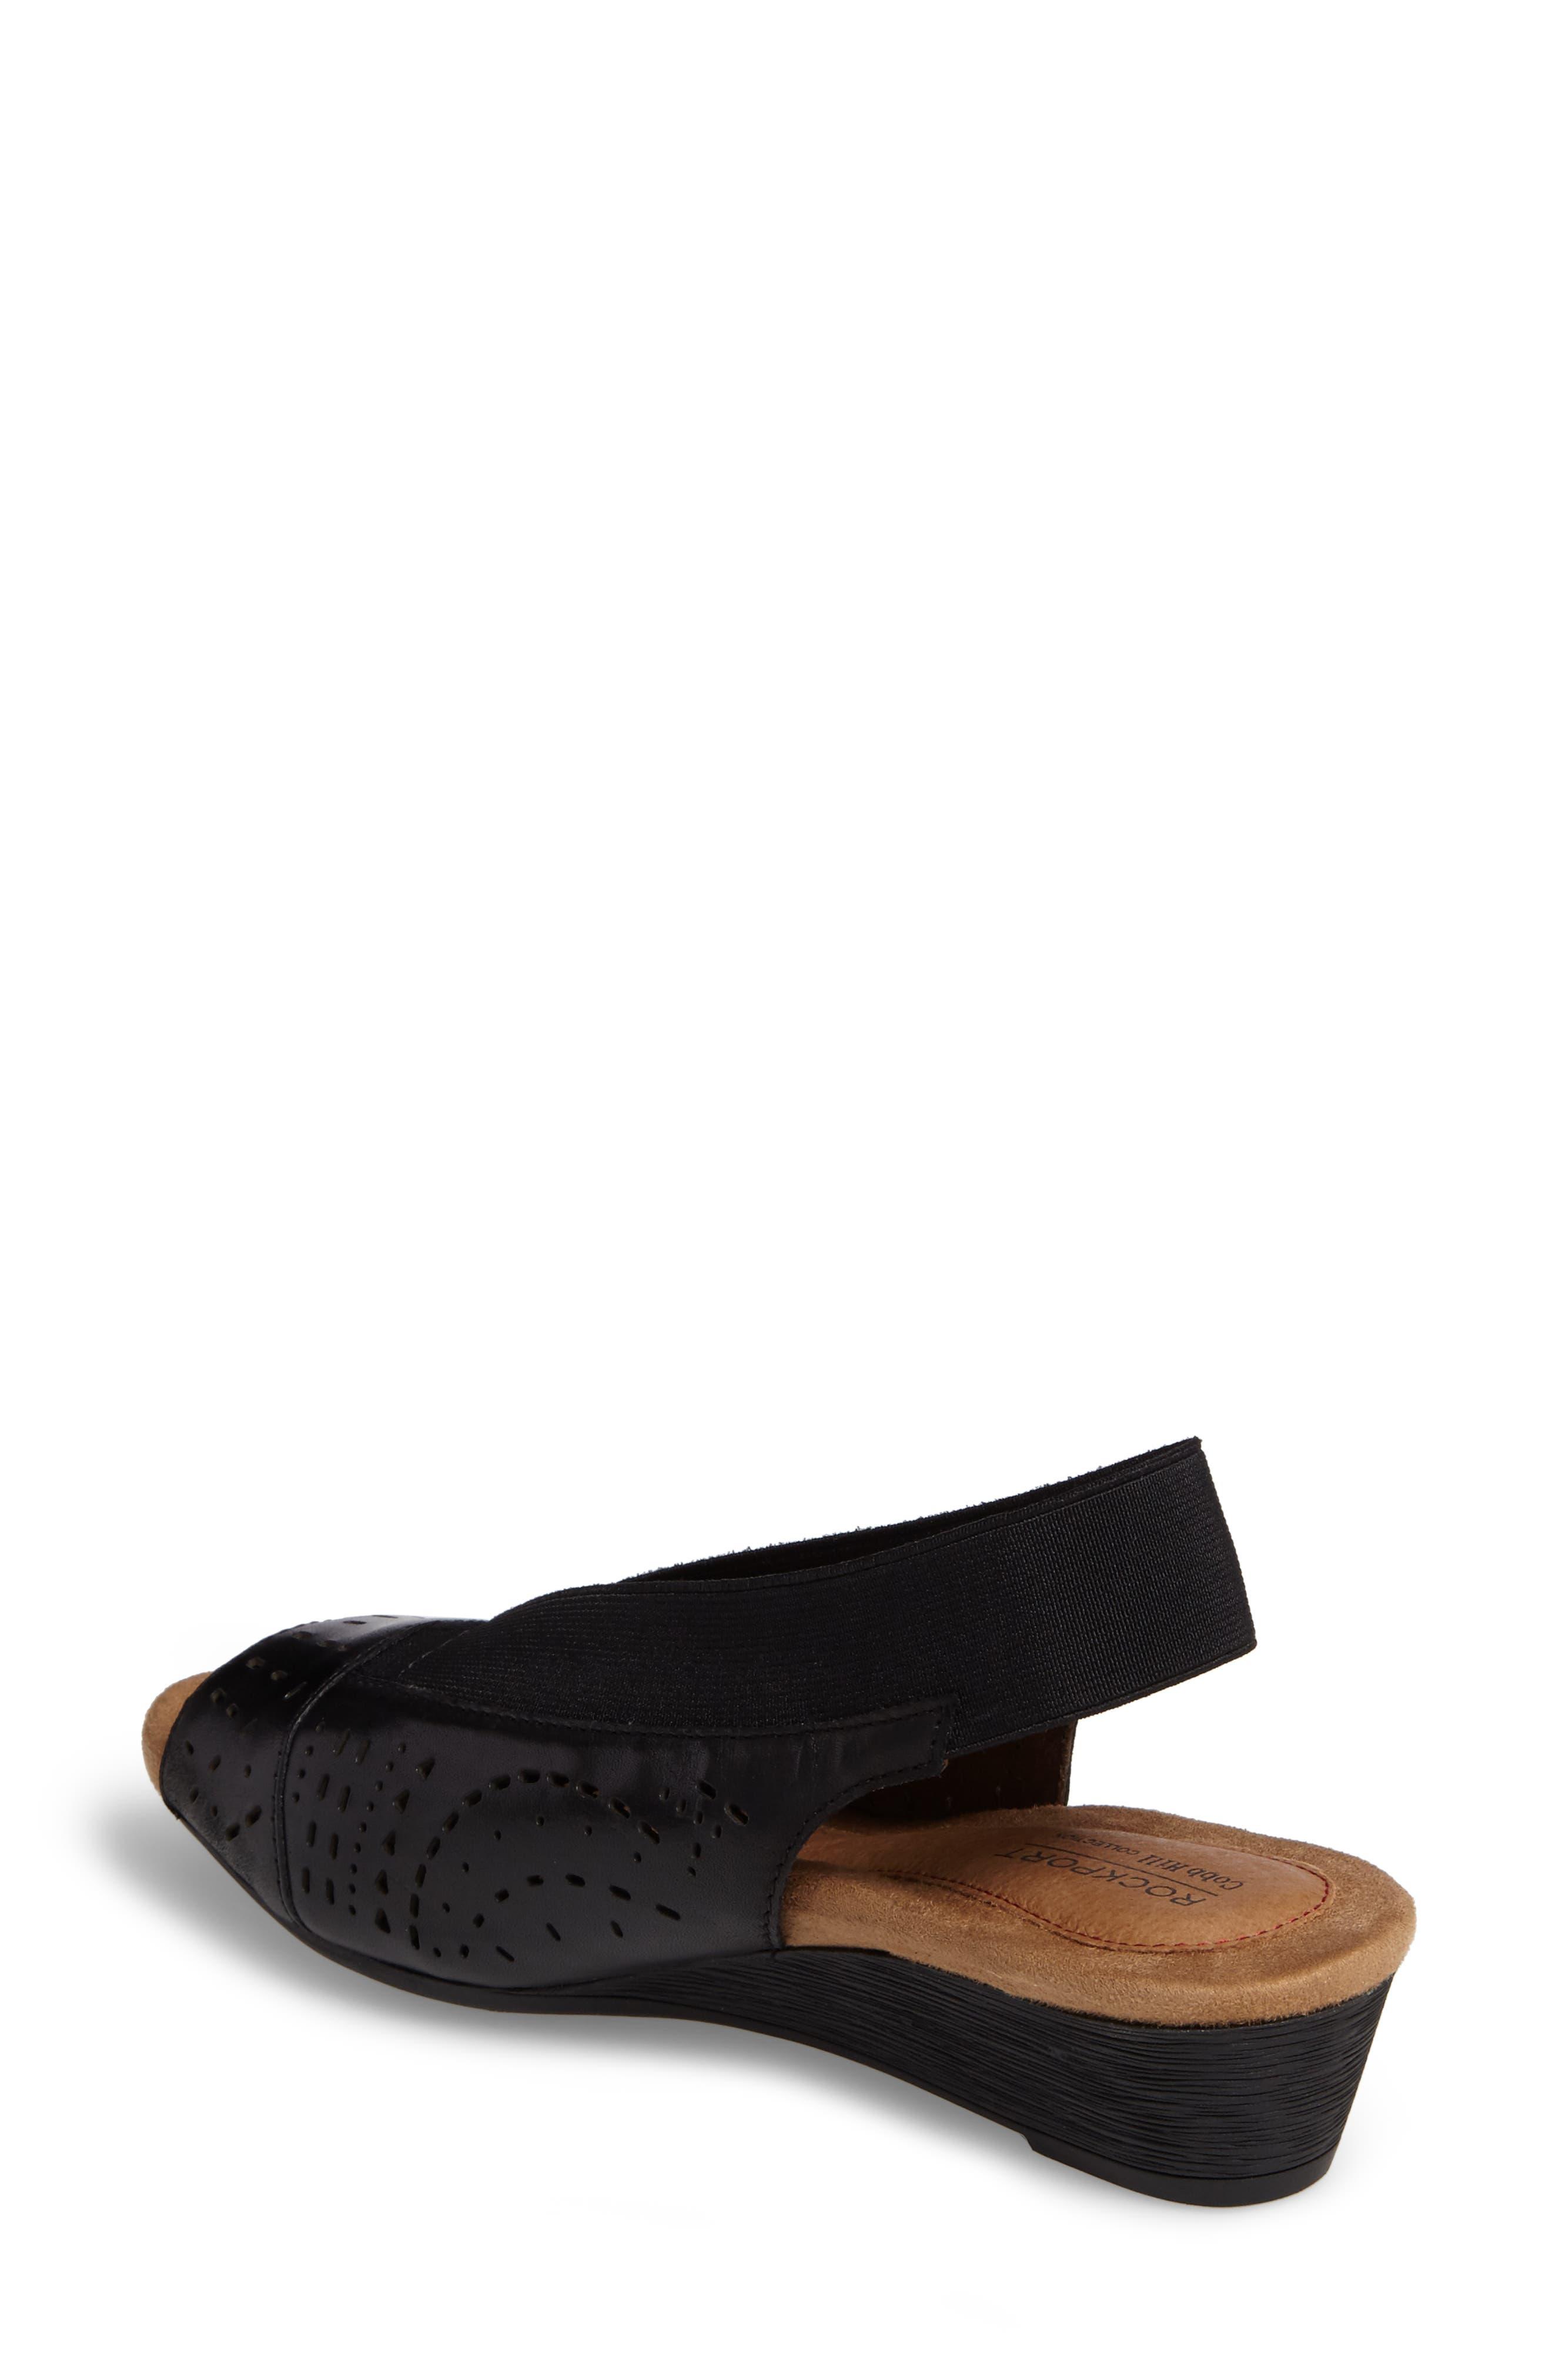 Judson Slingback Wedge Sandal,                             Alternate thumbnail 2, color,                             BLACK LEATHER